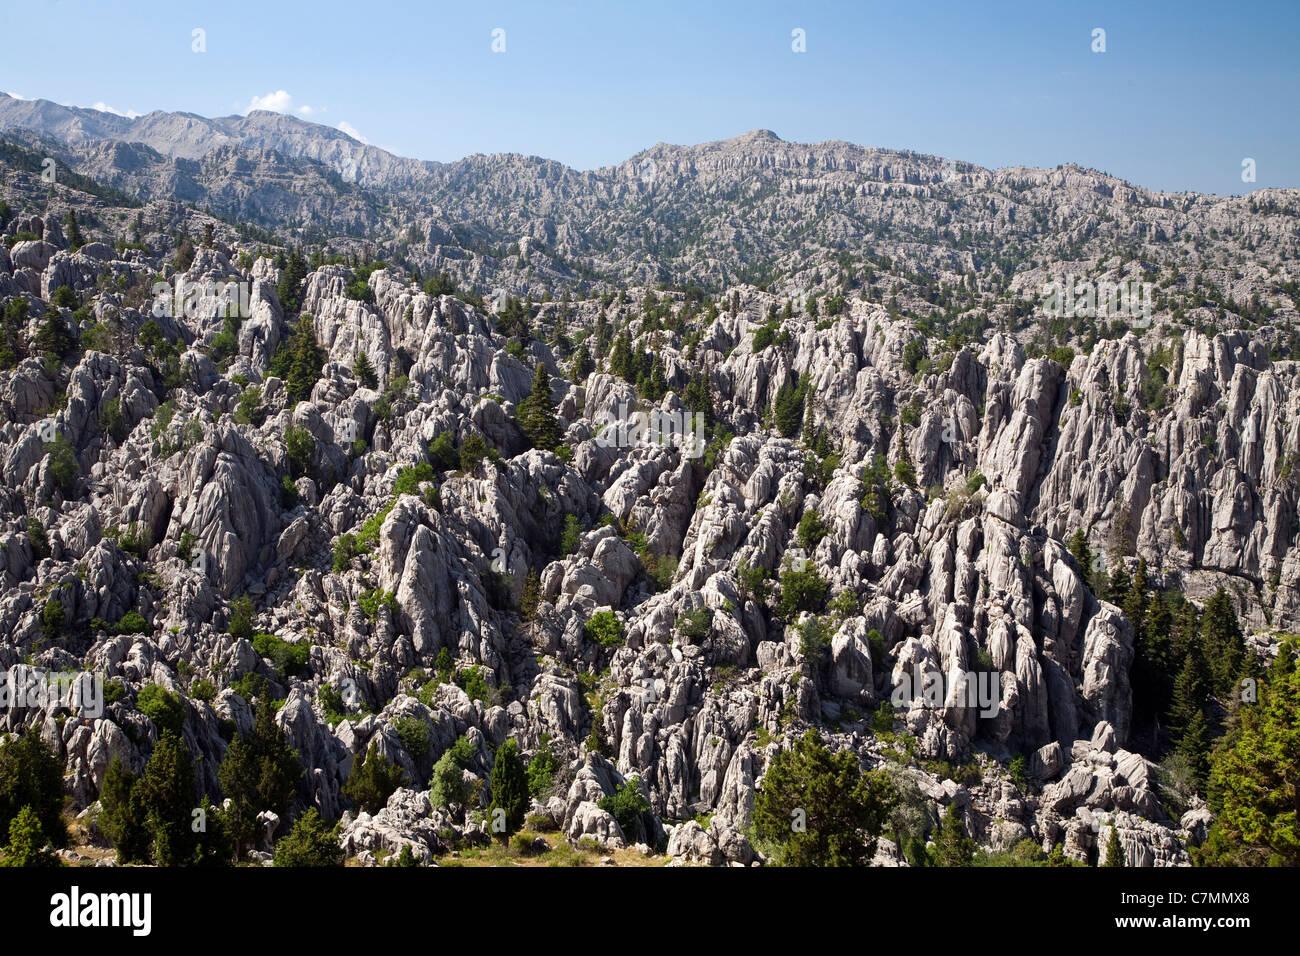 Karstic geology of Taurus Range in Mediterranean Turkey - Stock Image